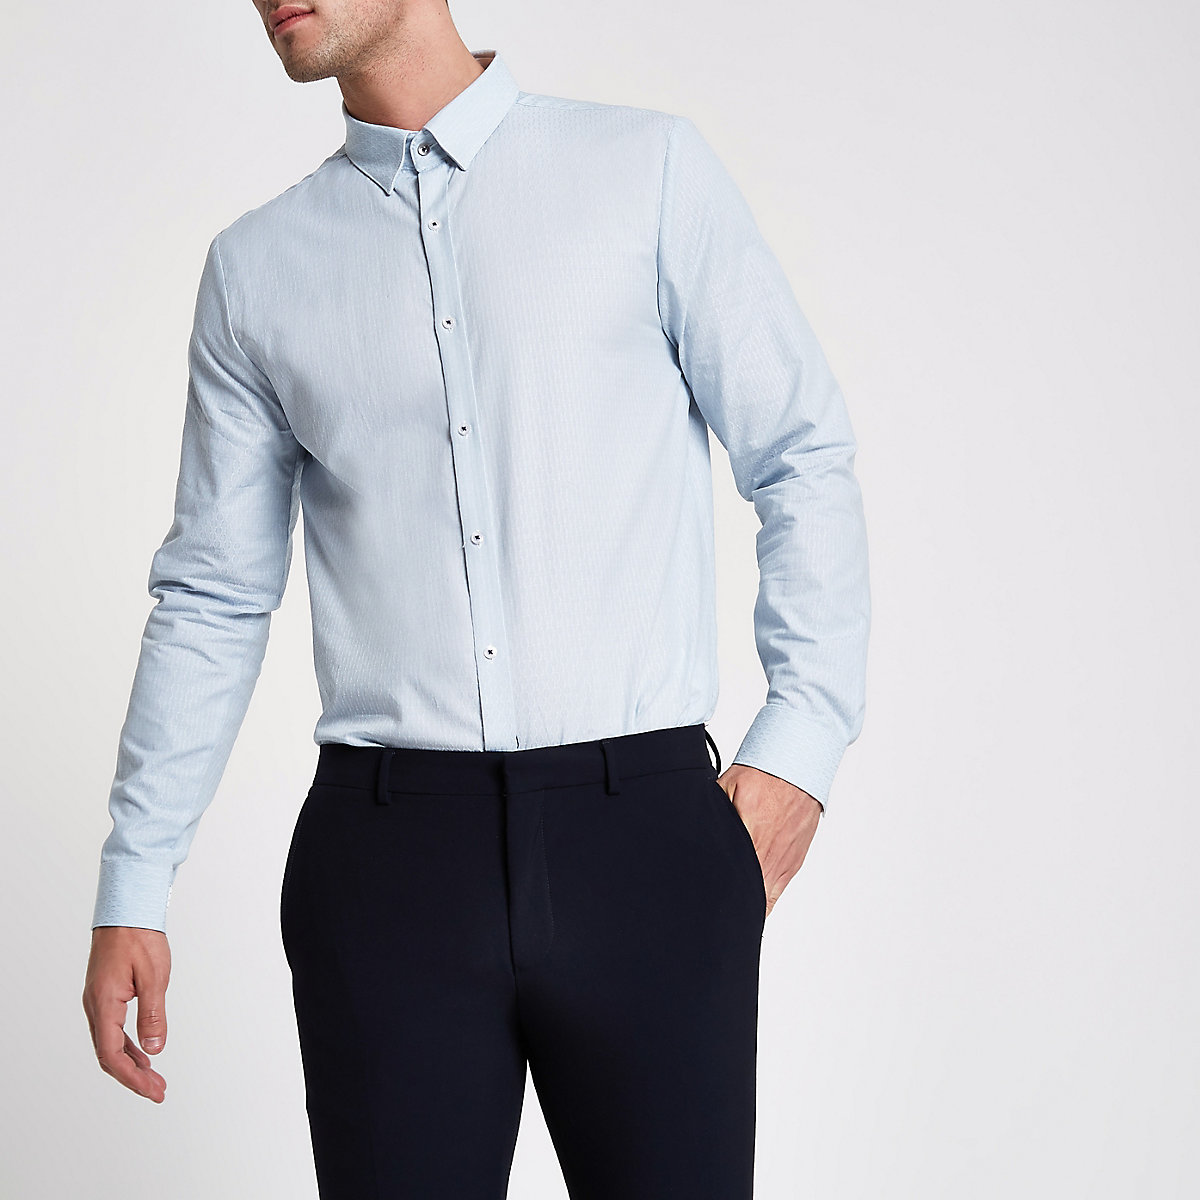 Light Blue Textured Tailored Fit Shirt Long Sleeve Shirts Shirts